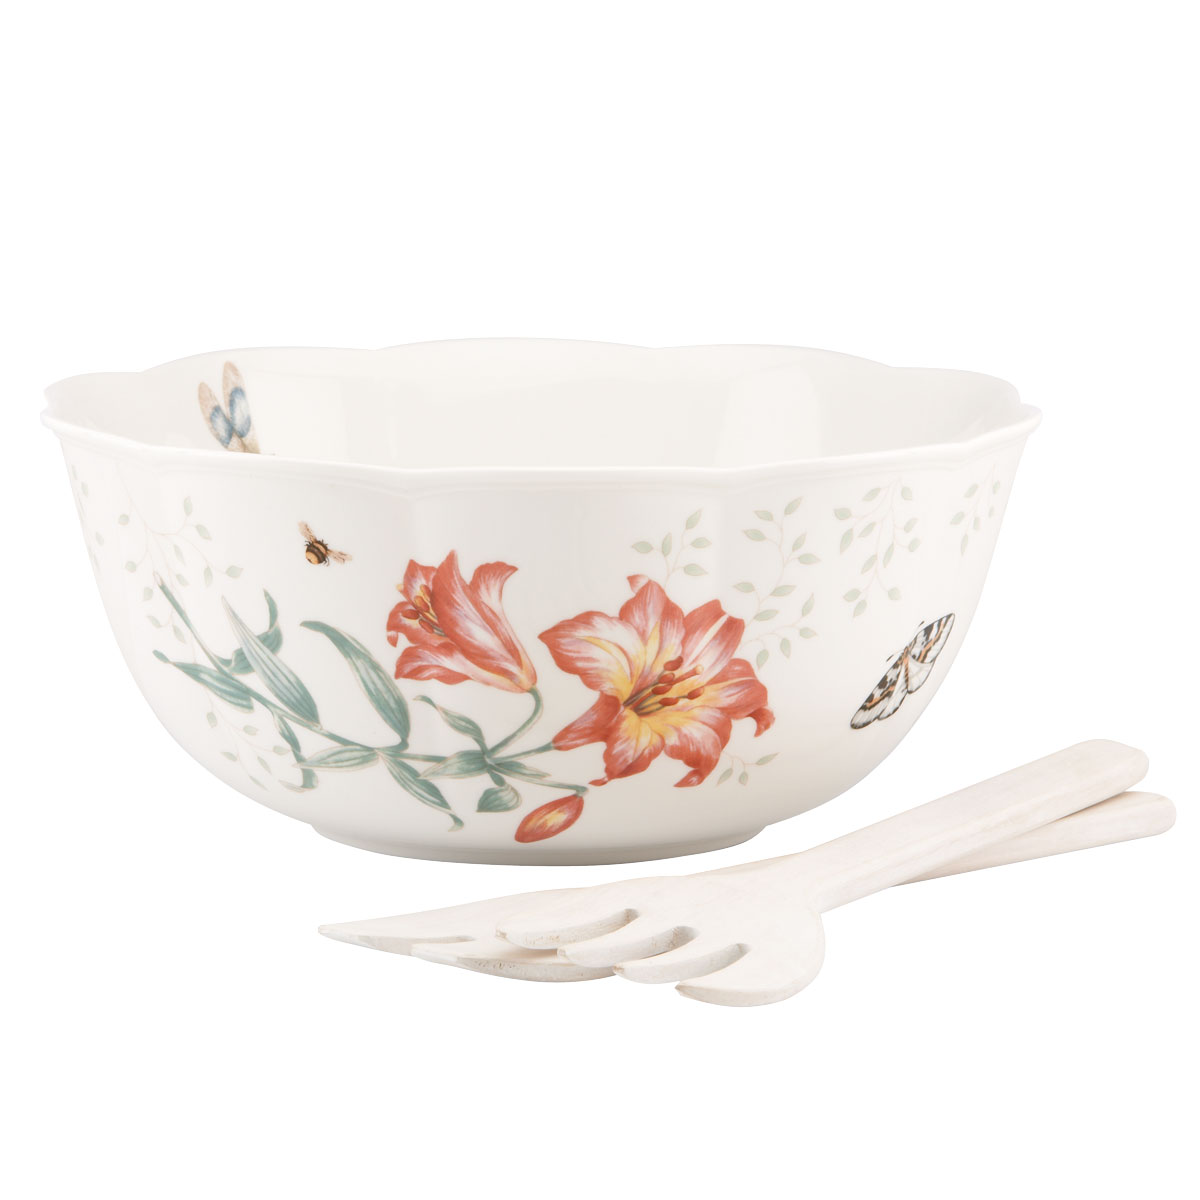 Lenox Butterfly Meadow Dinnerware Salad Bowl 3Pc Set